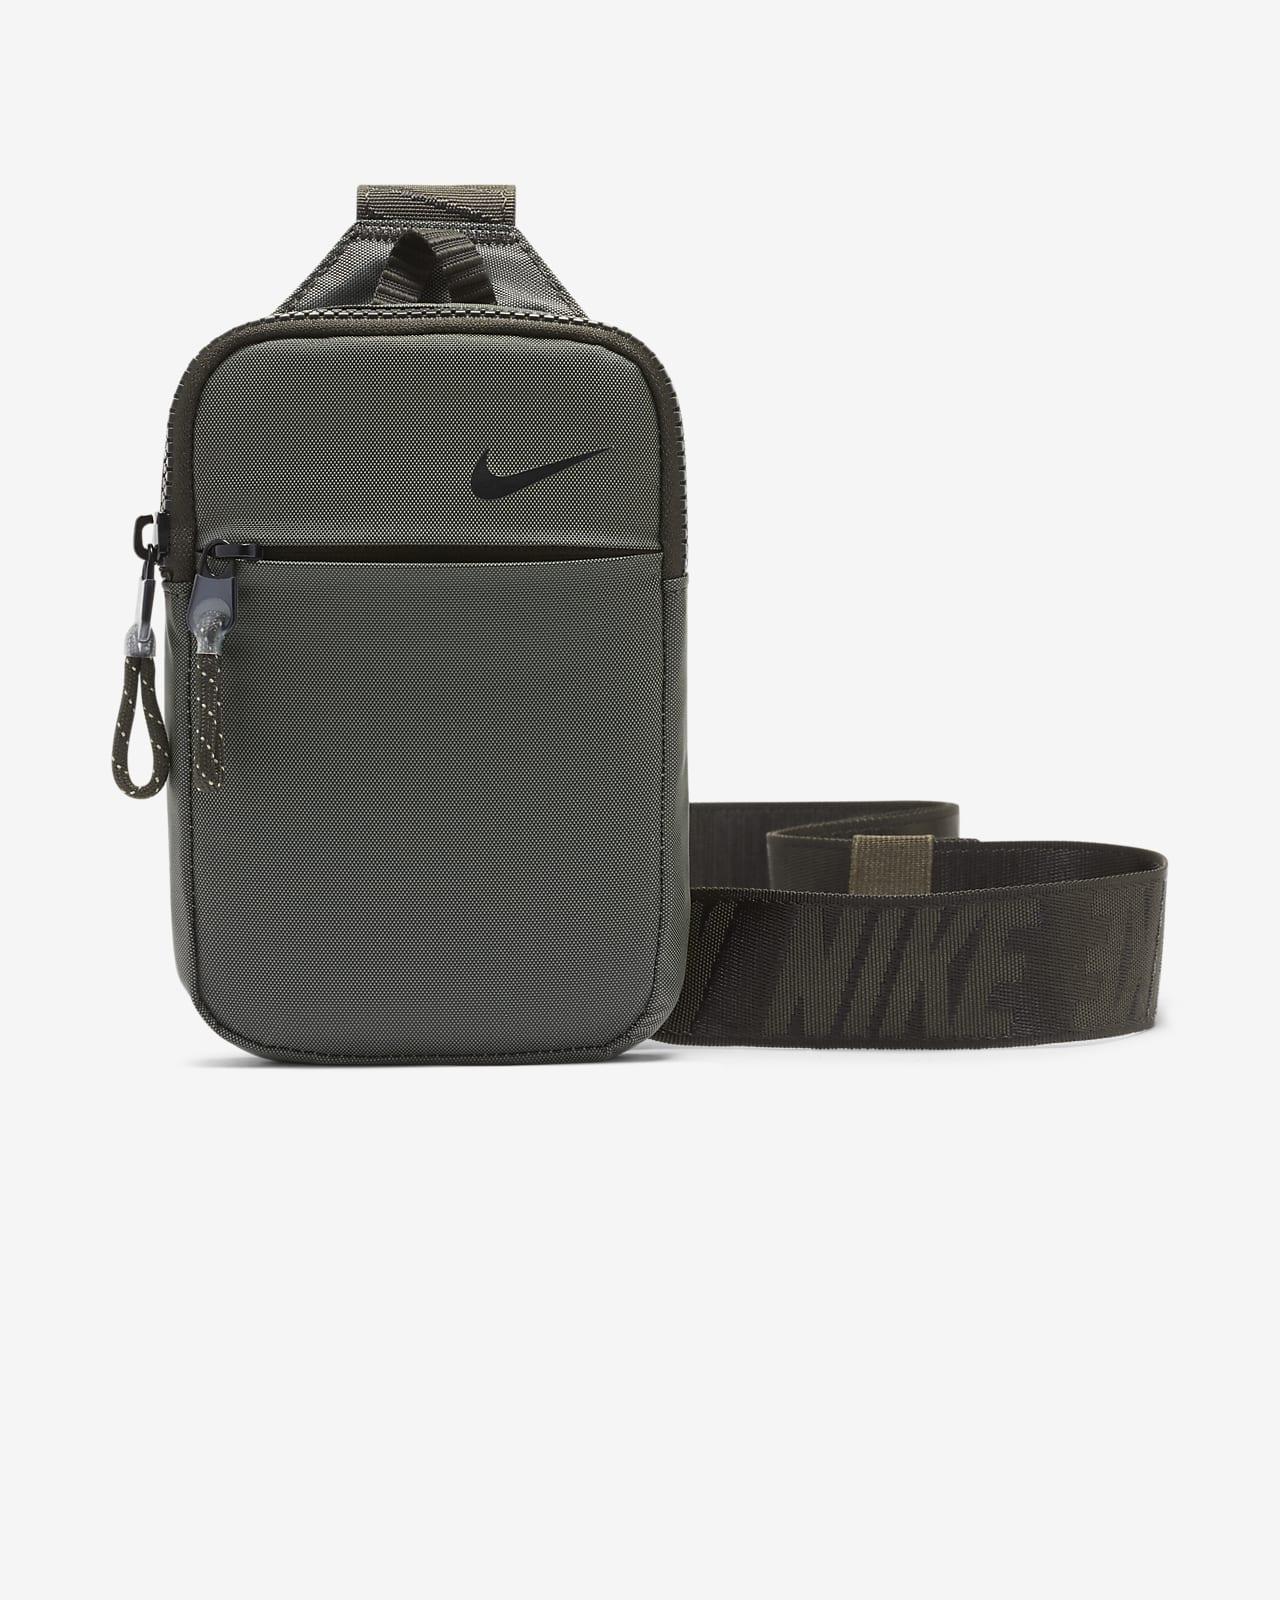 Nike Sportswear Essentials Hip Pack (Small)